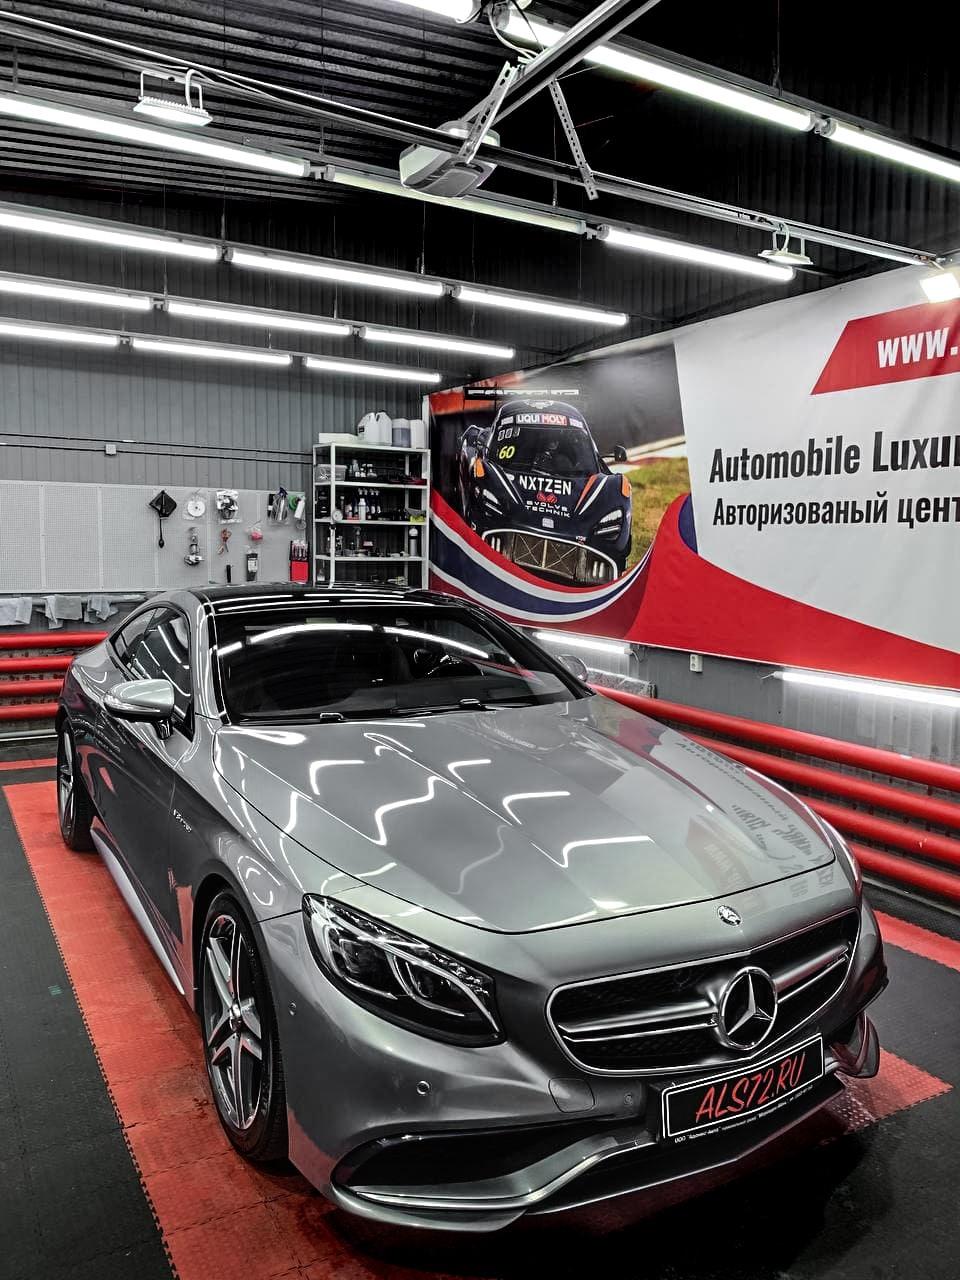 Mercedes S63 Coupe. Детейлинг: абразивная чистка стекол